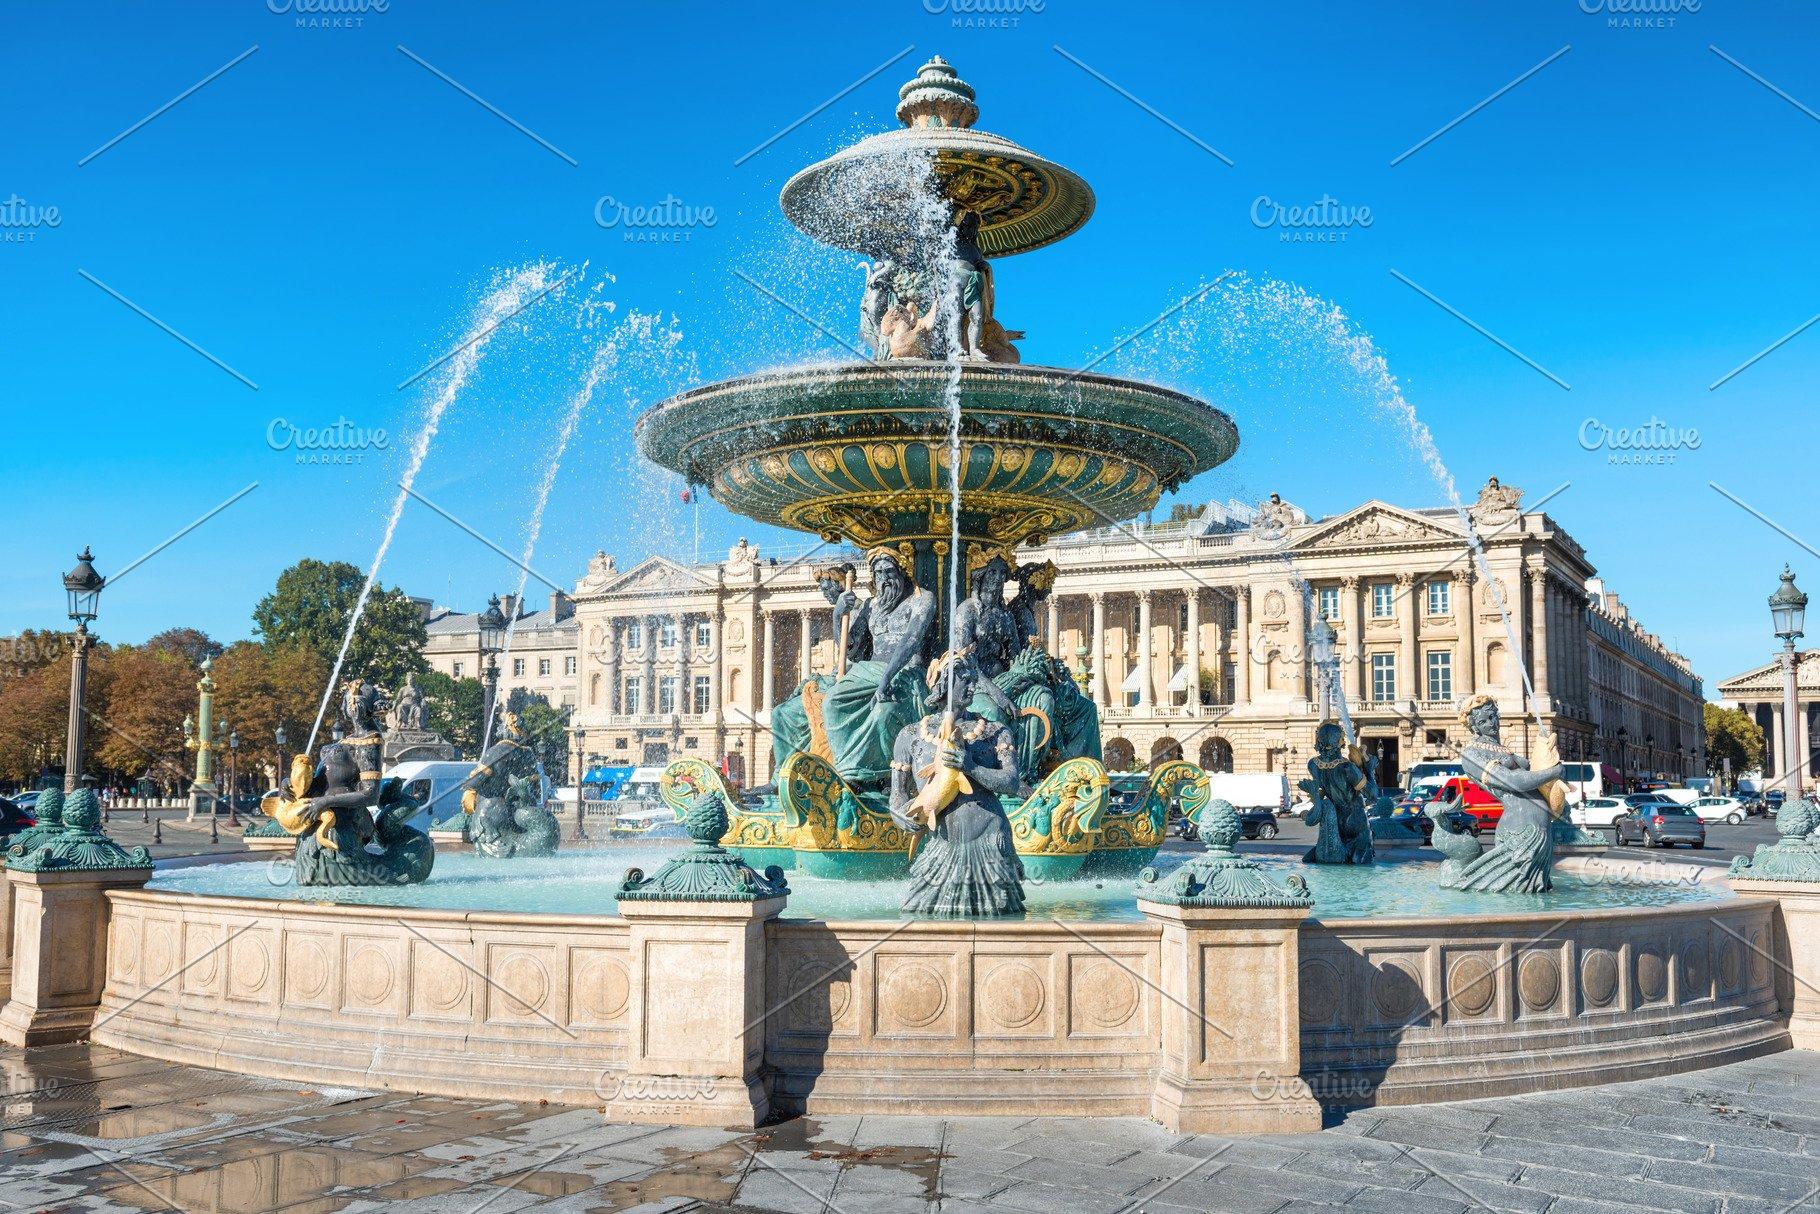 Plaza De La Concordia fountain on place de la concorde in